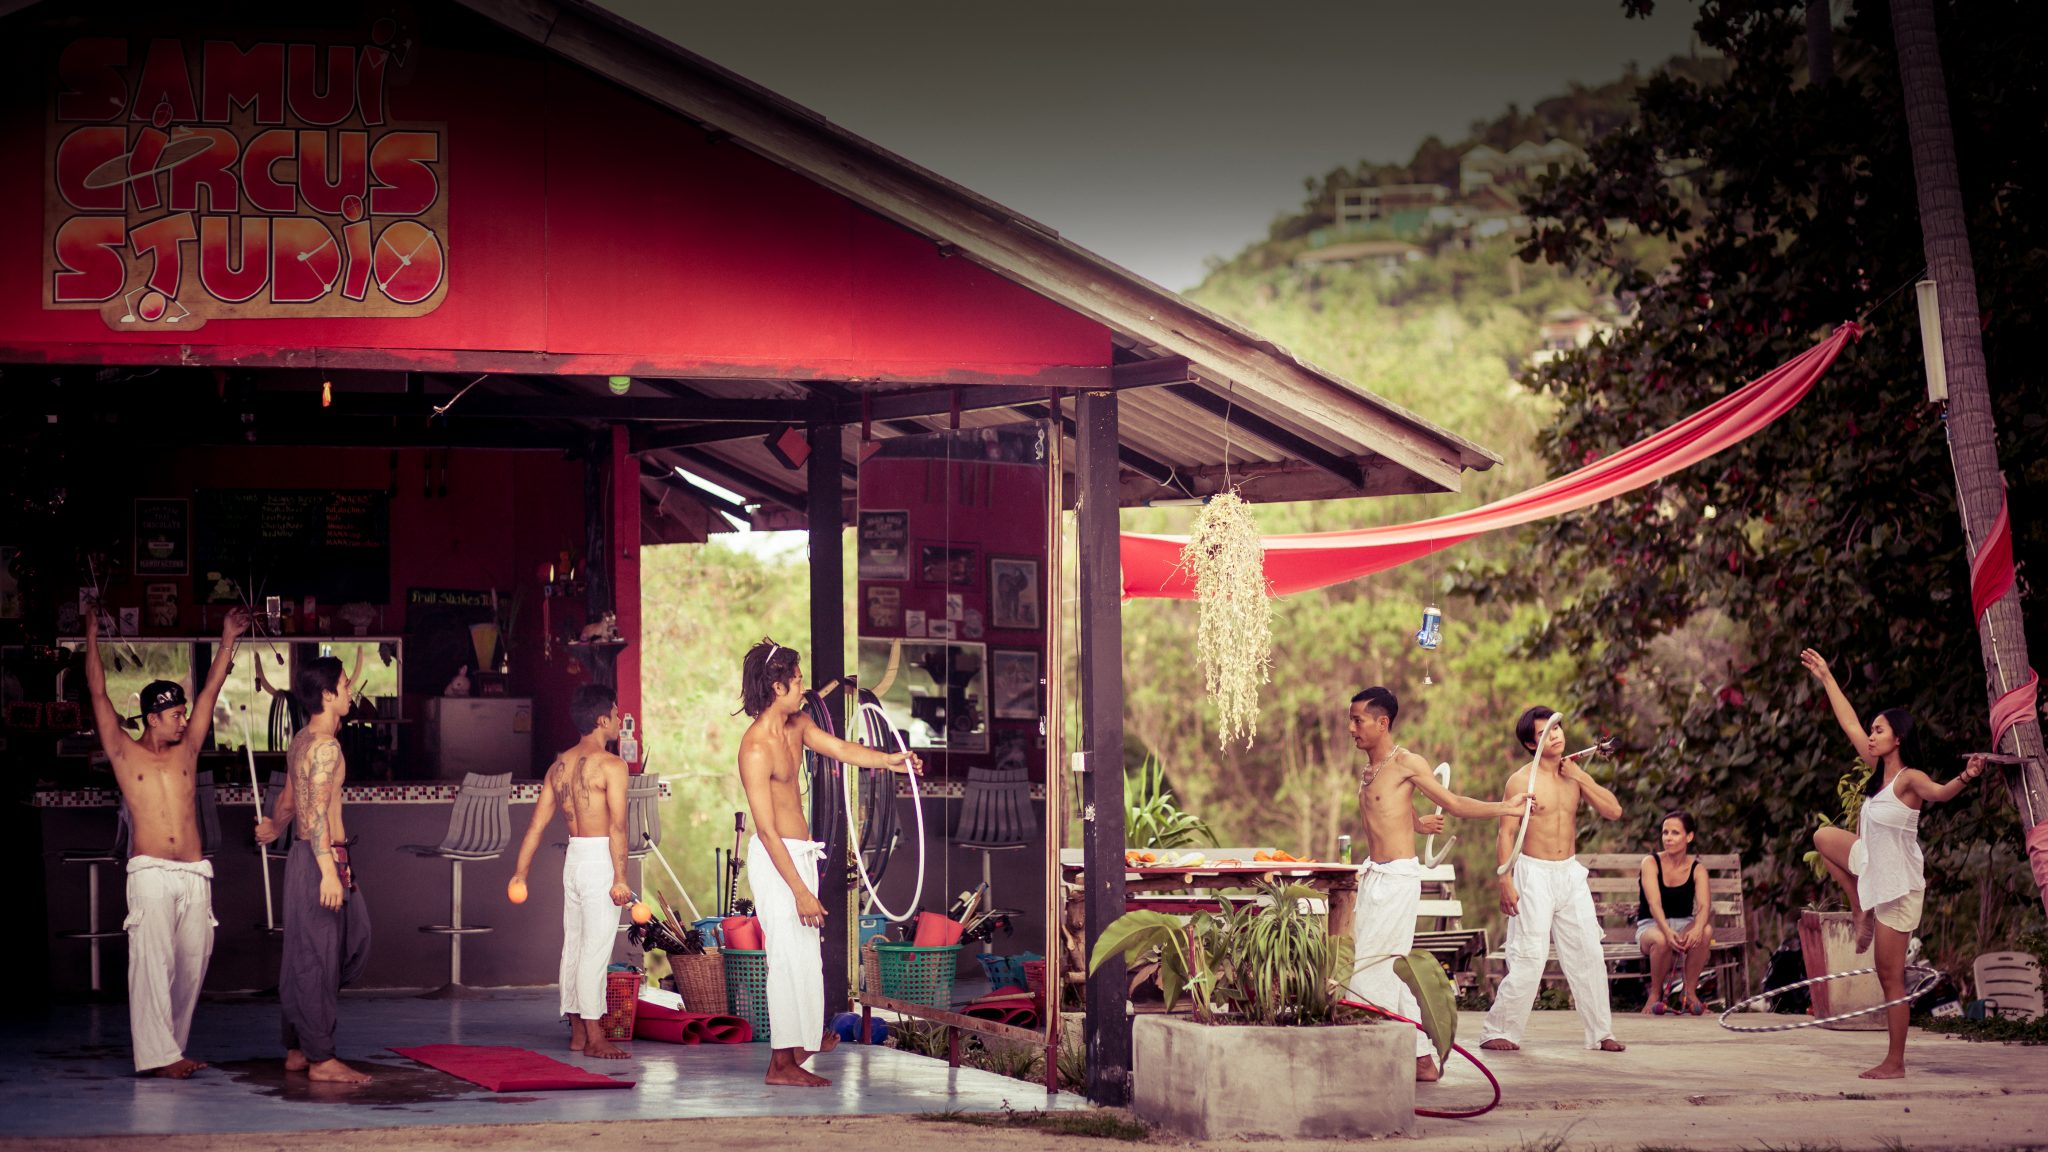 Samui Circus Studio